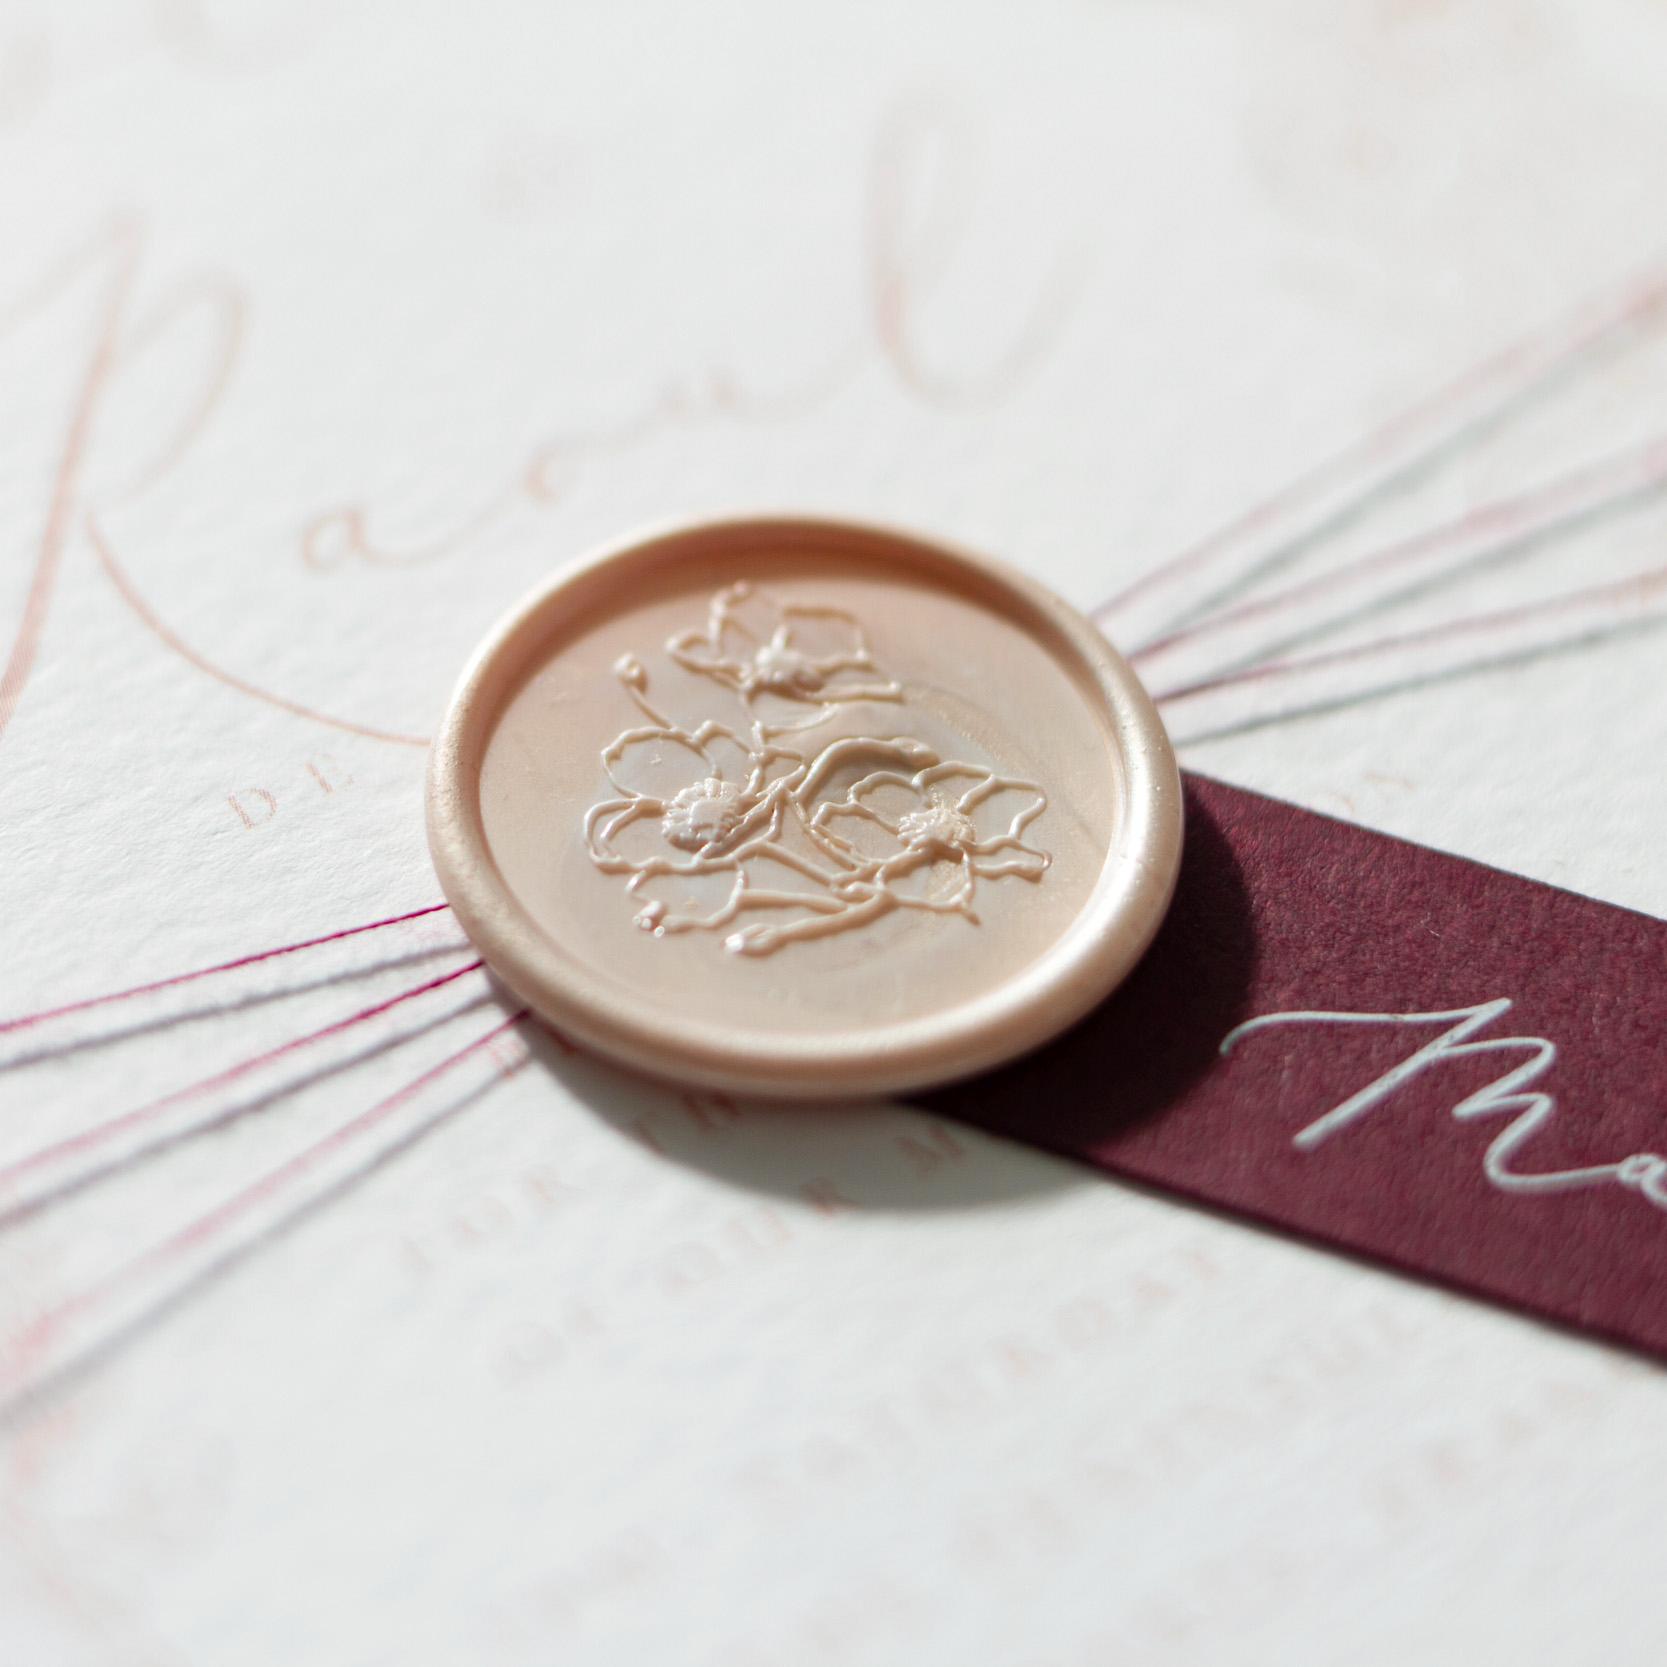 Blush Petals Blush Pink Wedding Stationery with Wax Seal Details1 - www.pinglepie.com.jpg